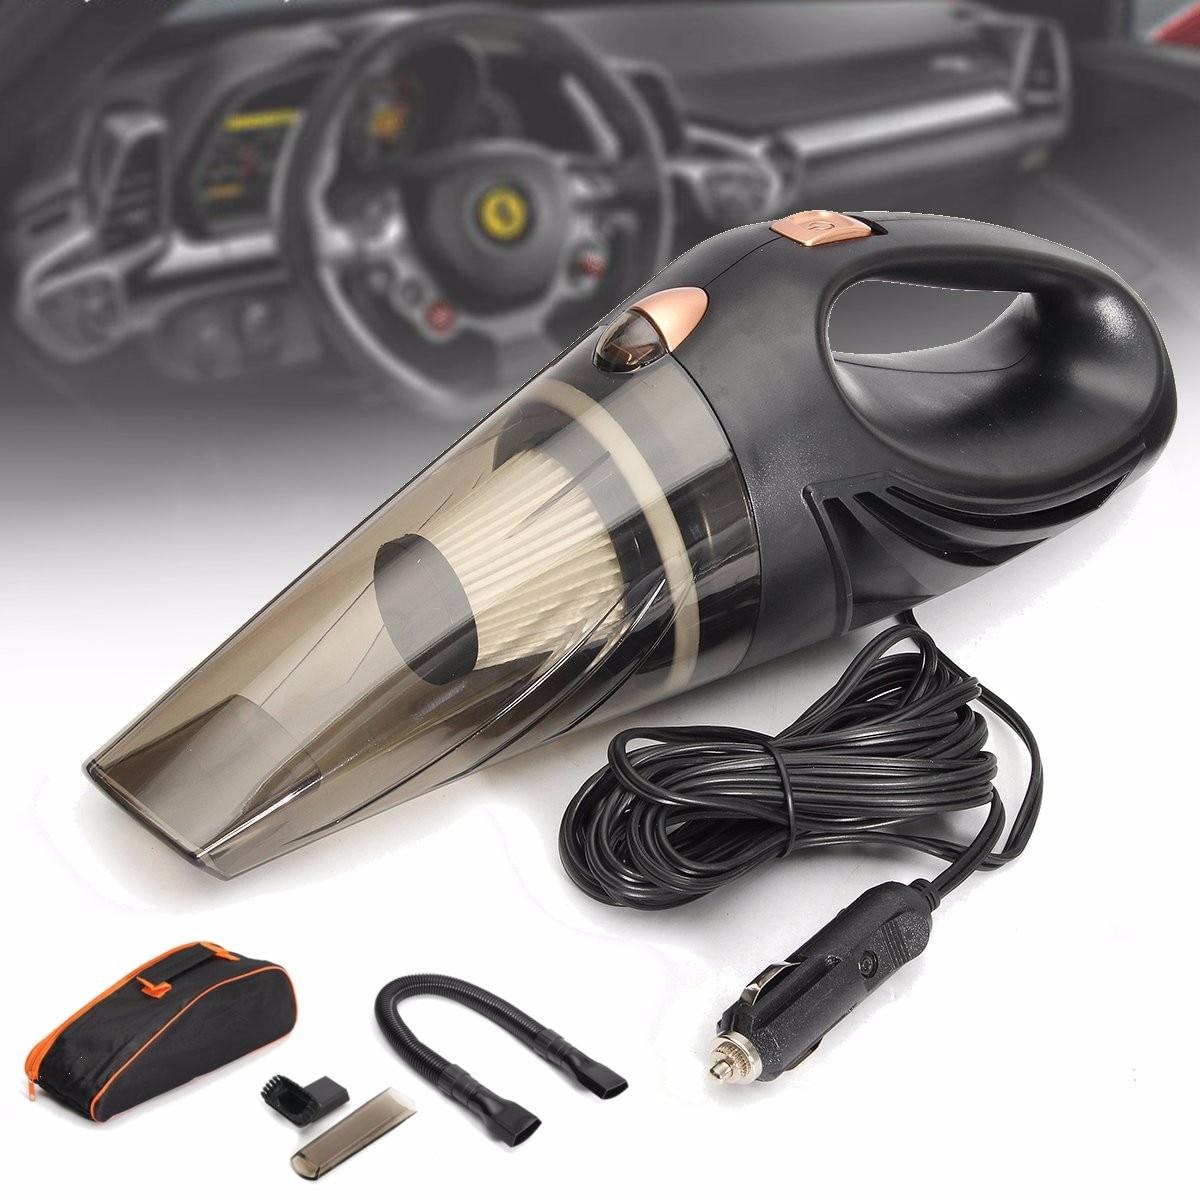 Car Vacuum 12V 106W Wet Dry Dual Use Car Vacuum Cleaner Vehicle House Automobile Portable Car Handheld Vacuum Cleaner